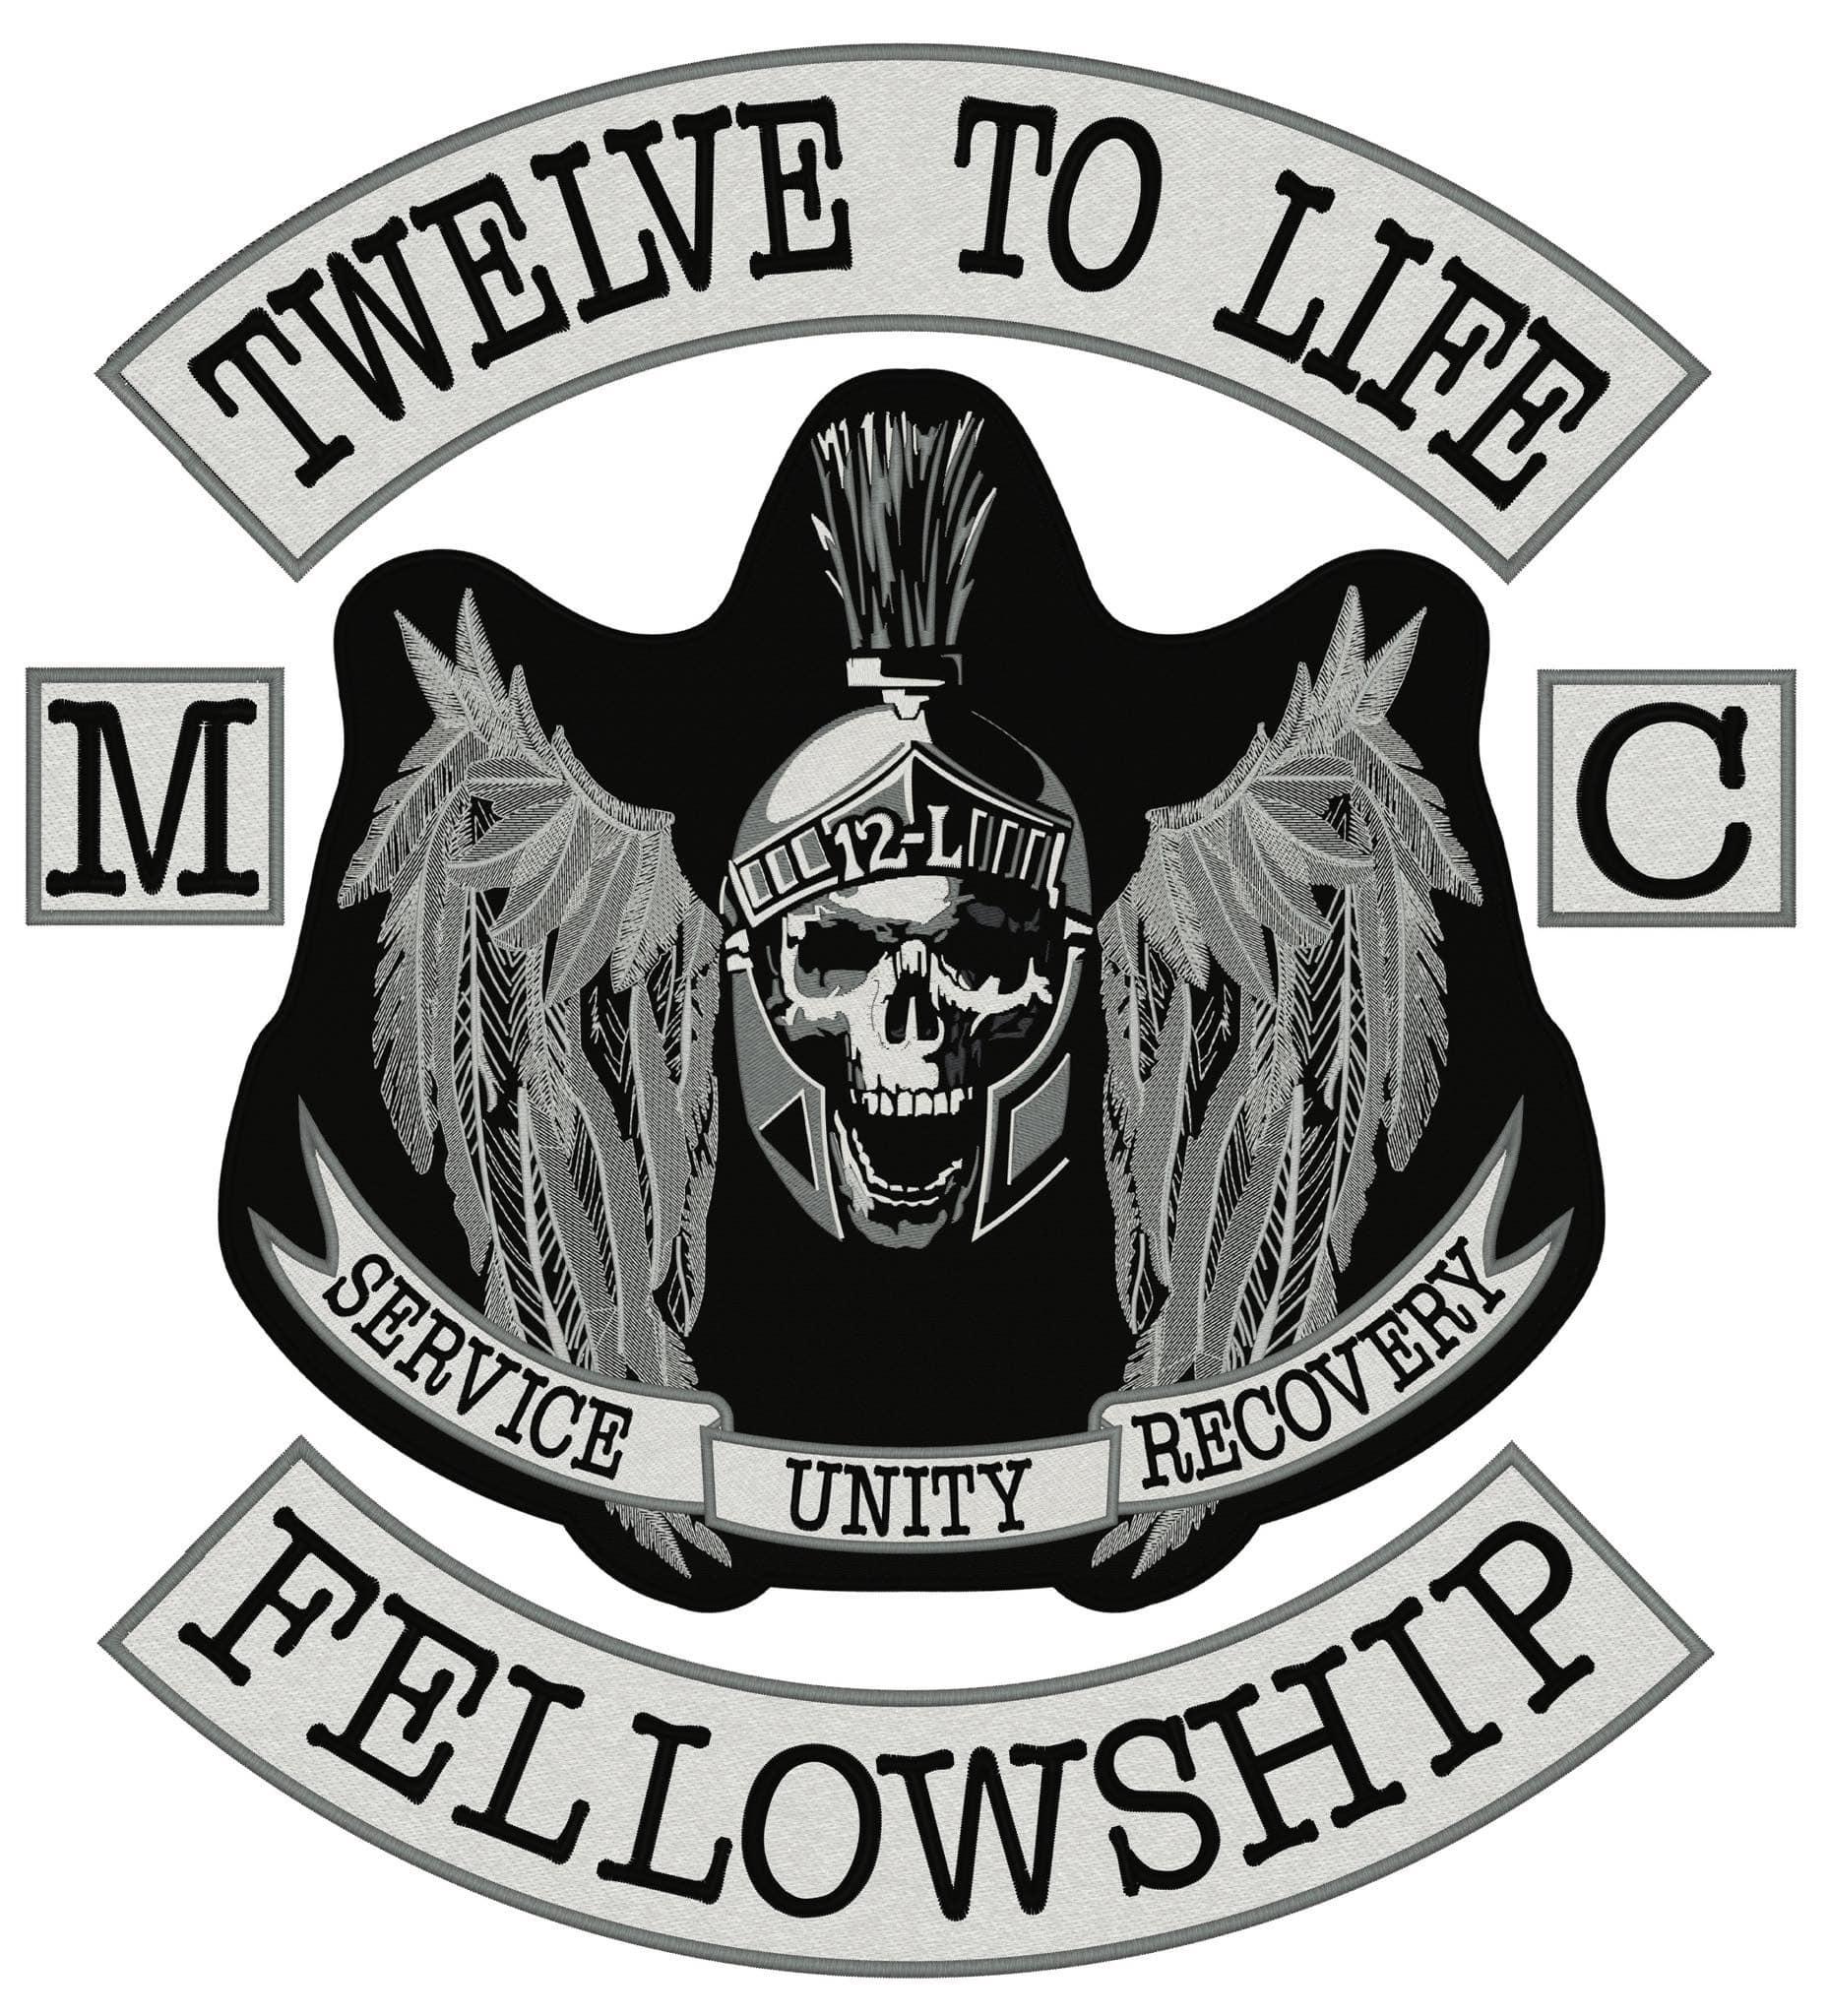 Twelve To Life Motorcycle Club Fellowship